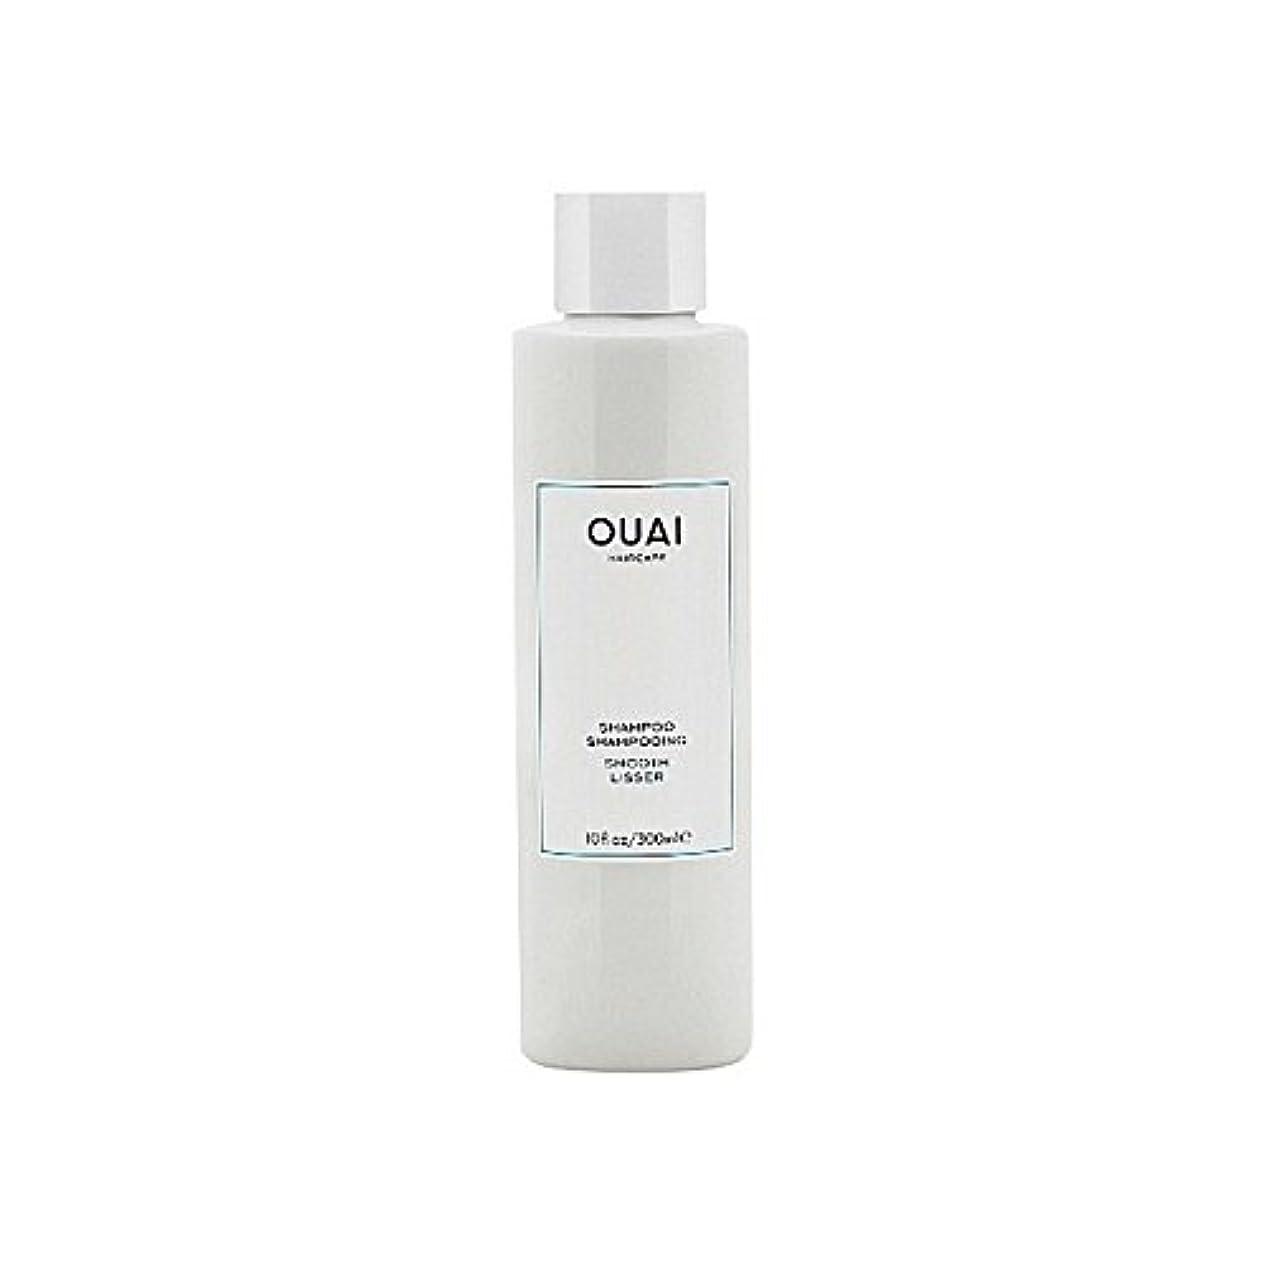 Ouai Smooth Shampoo 300ml (Pack of 6) - スムーズなシャンプー300ミリリットル x6 [並行輸入品]